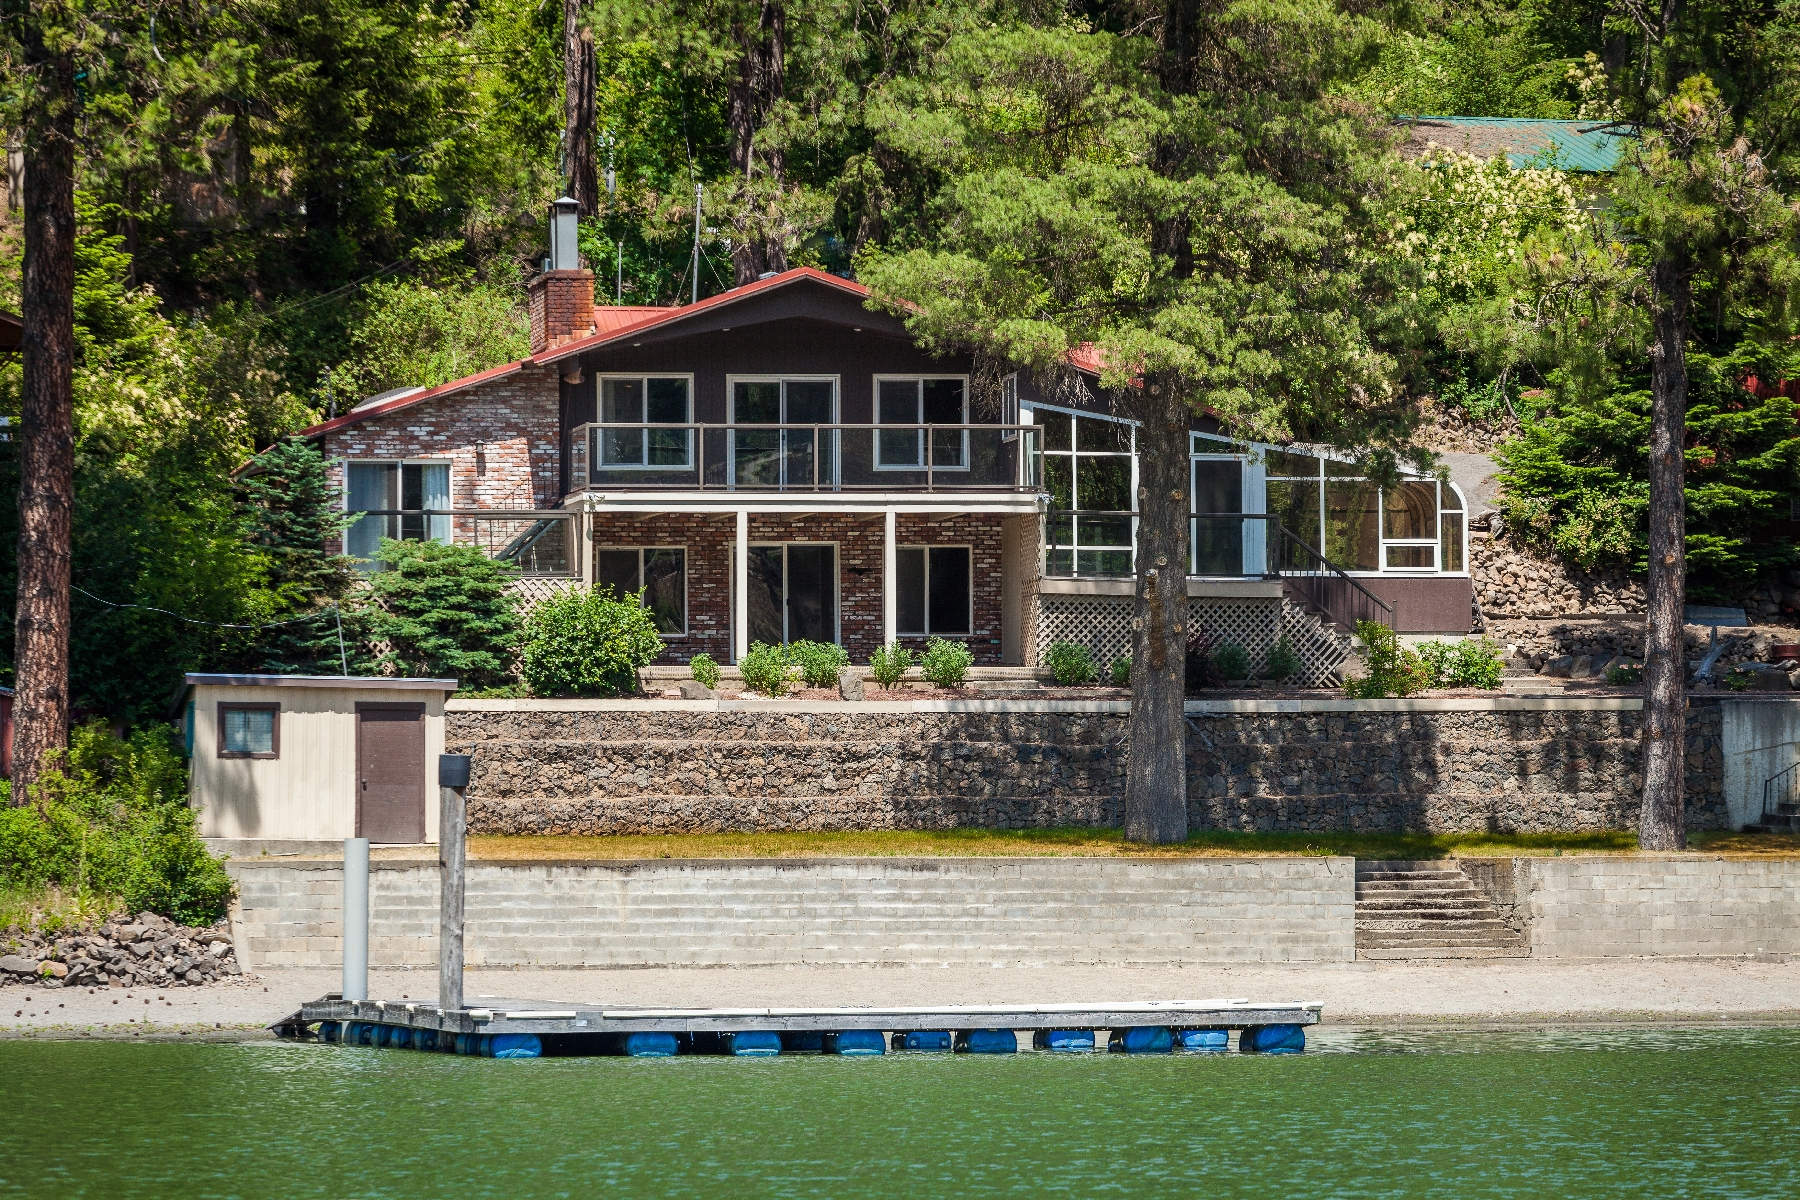 Nhà ở một gia đình vì Bán tại Lake Coeur d'Alene Waterfront 4052 S Westway Dr Coeur D Alene, Idaho 83814 Hoa Kỳ